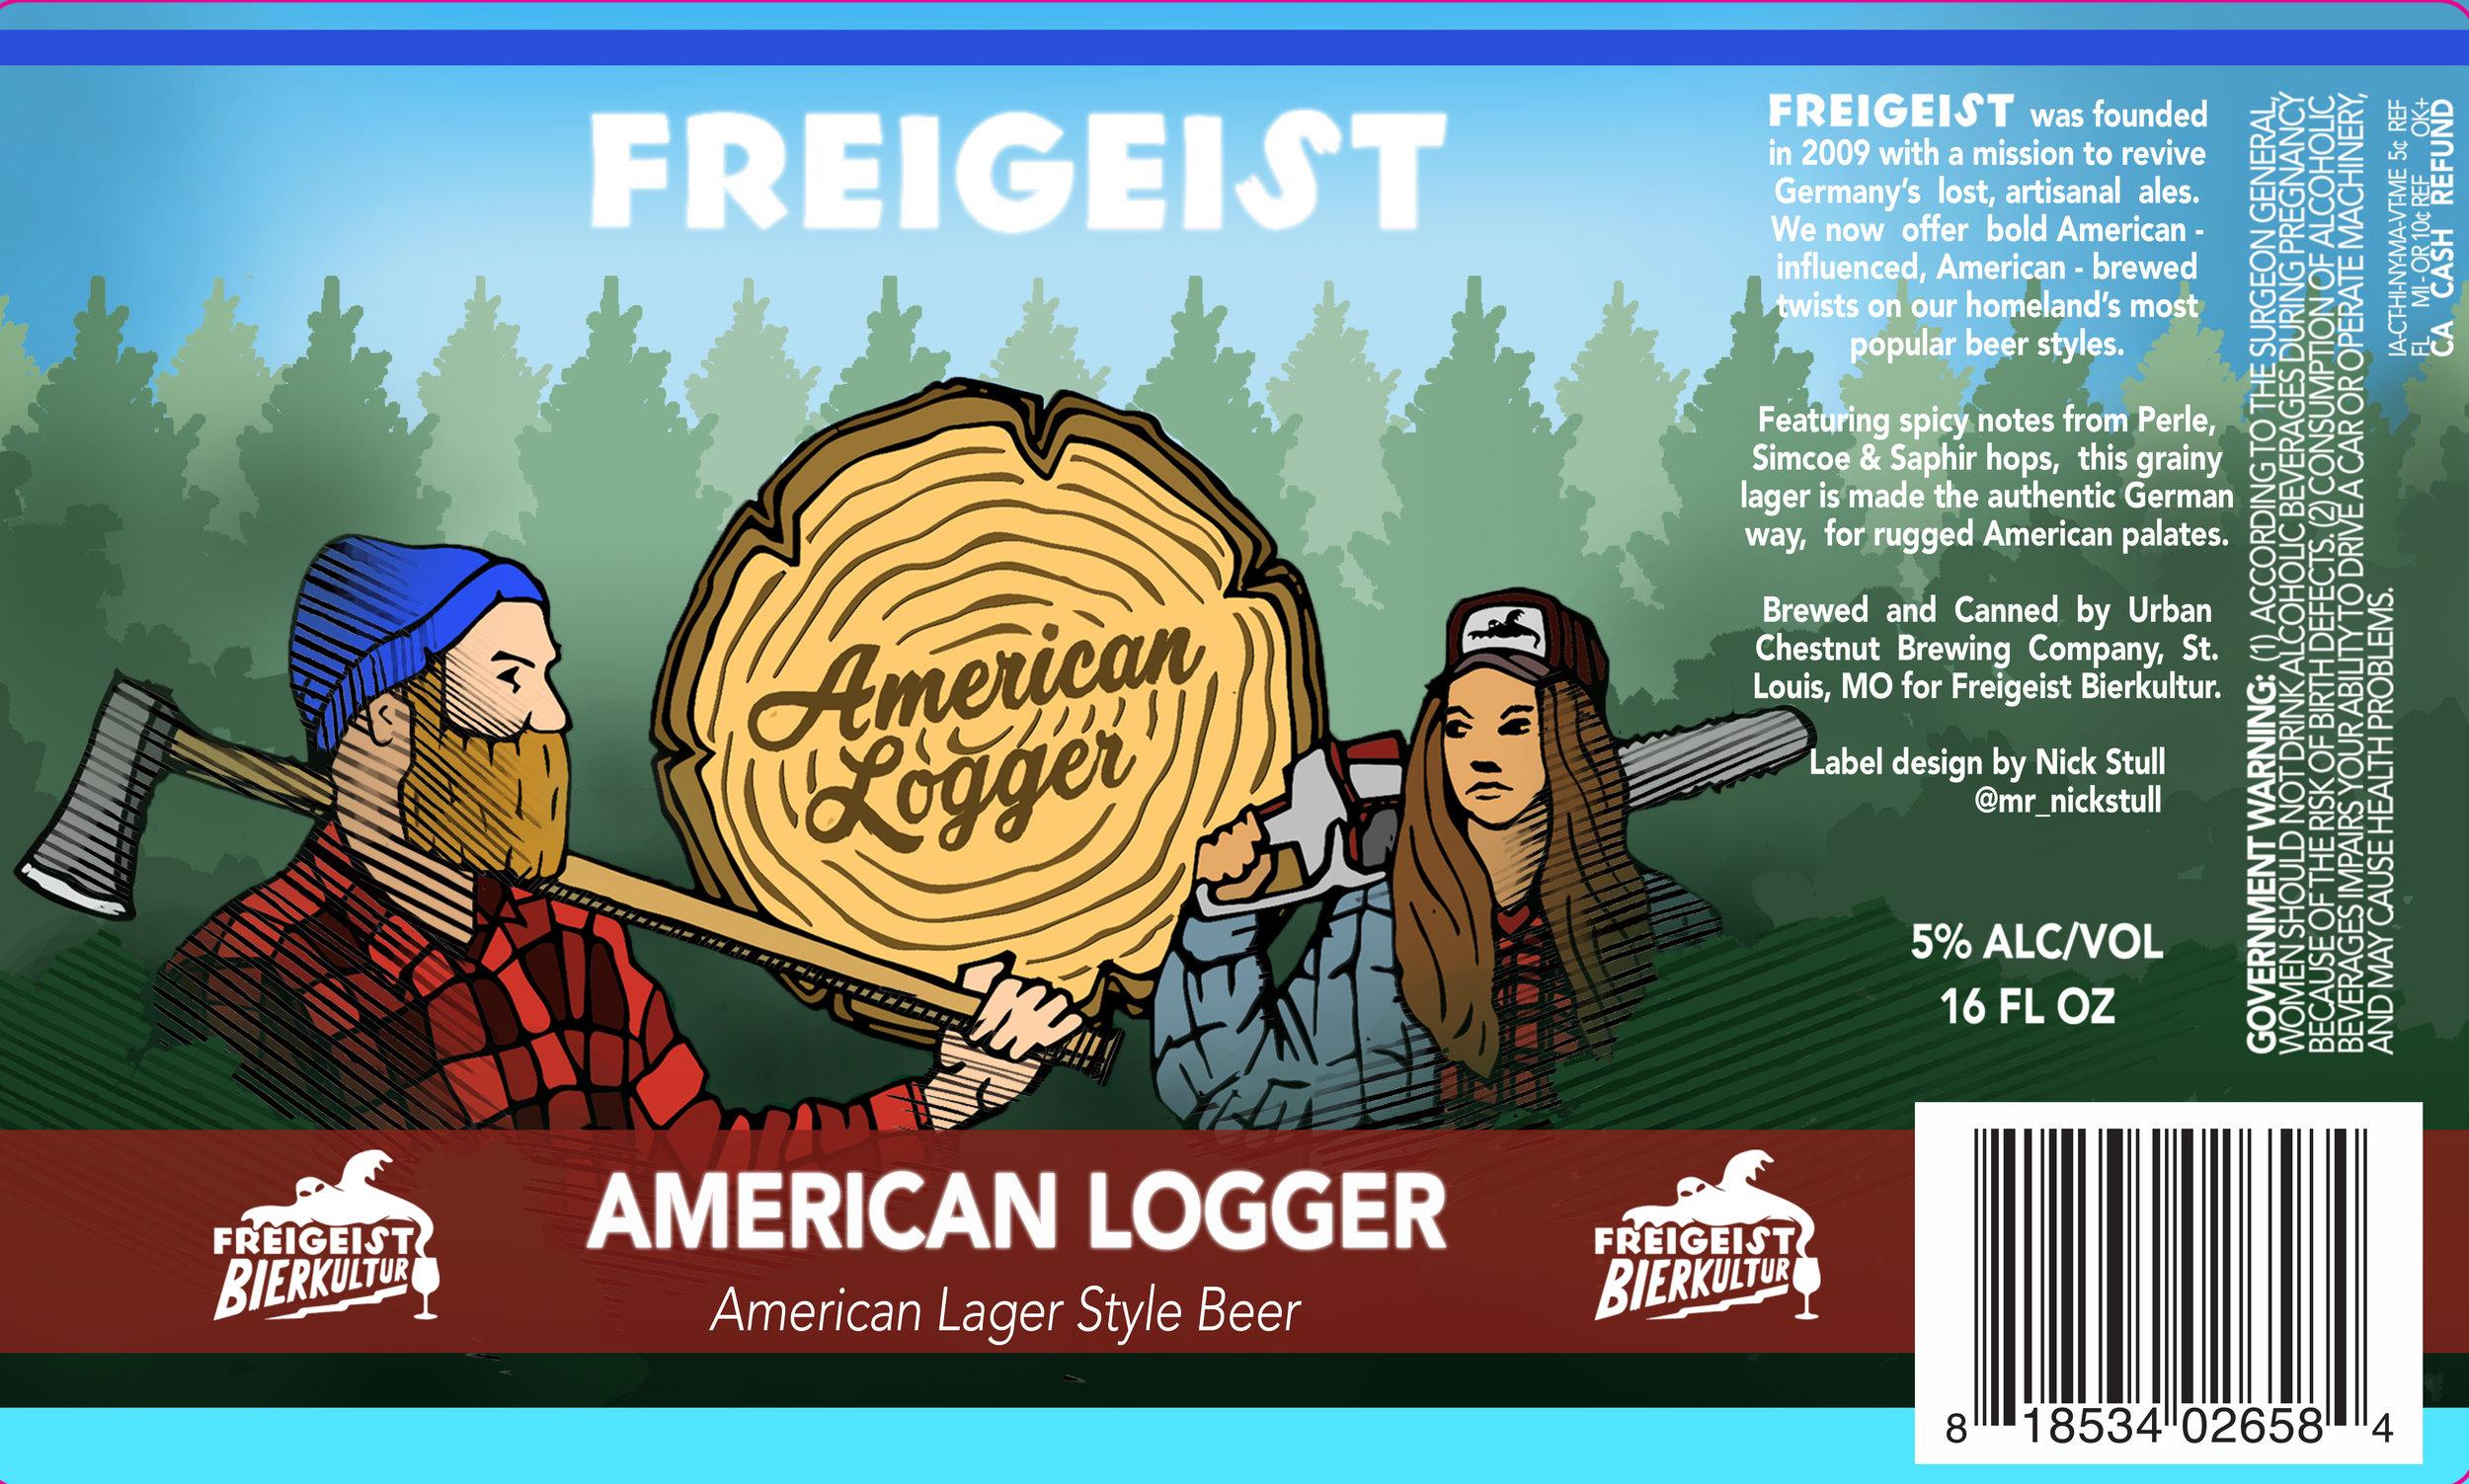 American Logger | Beer Label | Freigeist Brewery | Stolberg, Germany